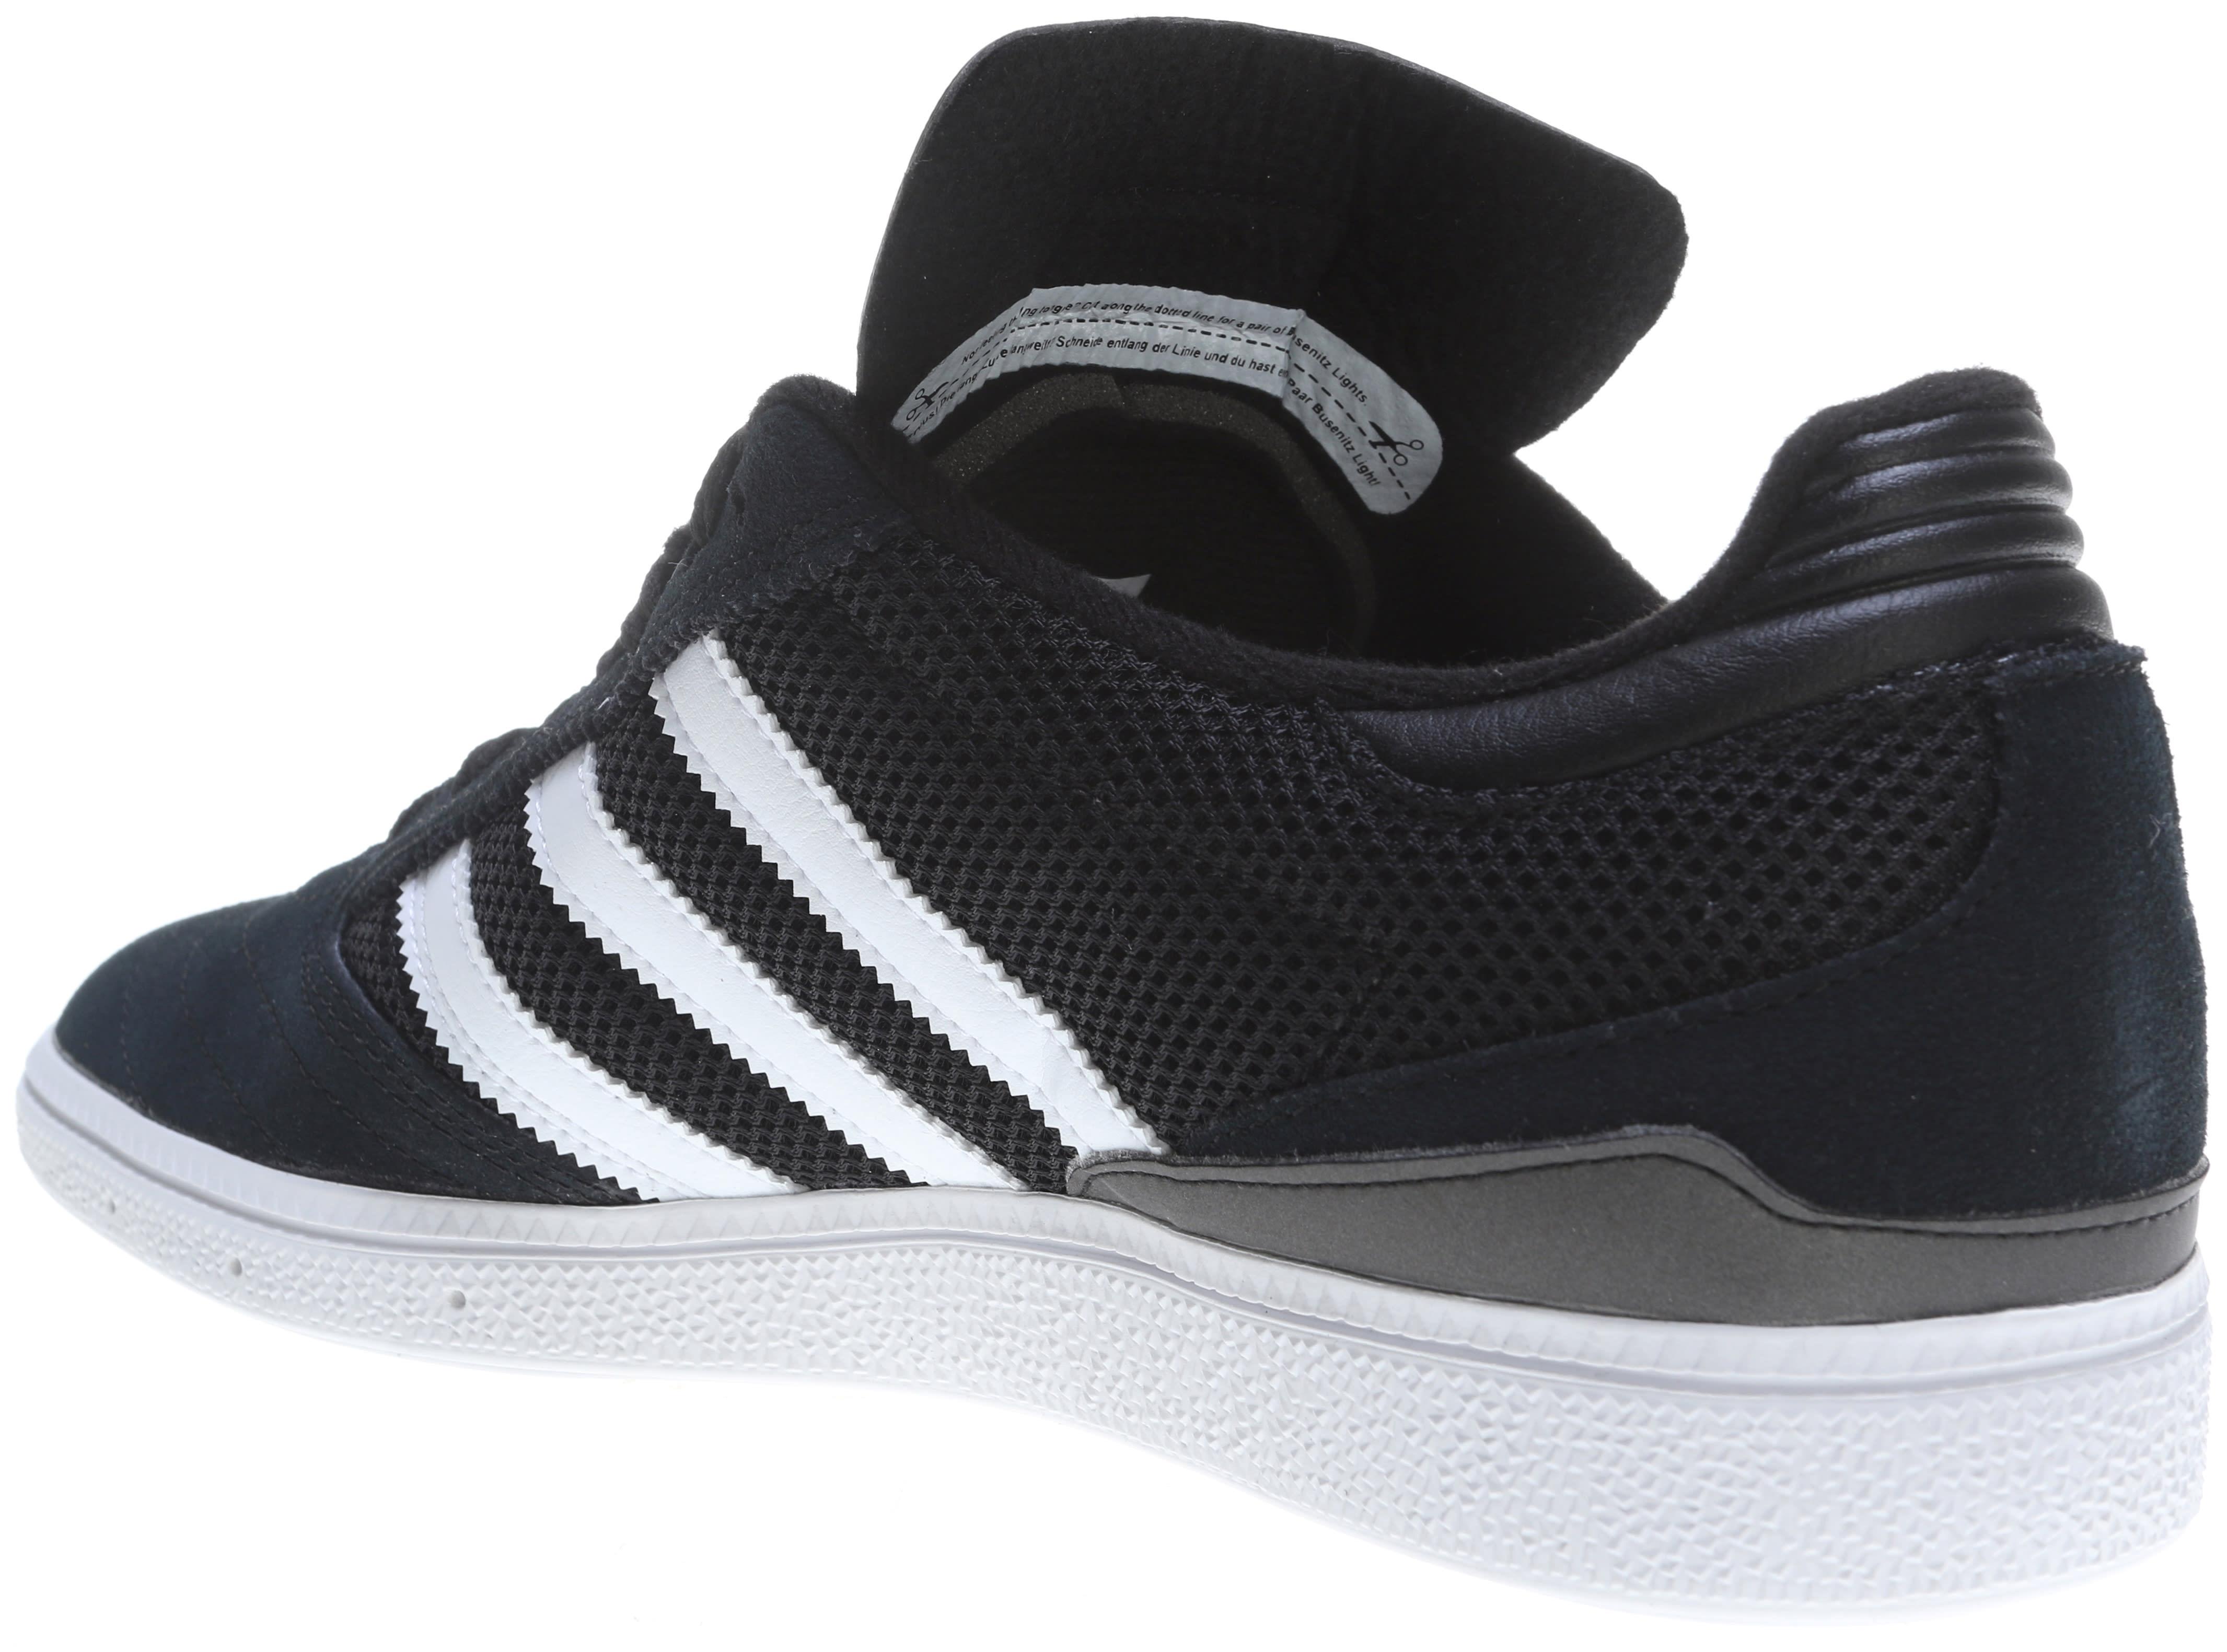 Adidas Skate Skate Shoes Busenitz Adidas Pro Glitz Style Guru: Moda, Glitz 5a6e52b - temperaturamning.website